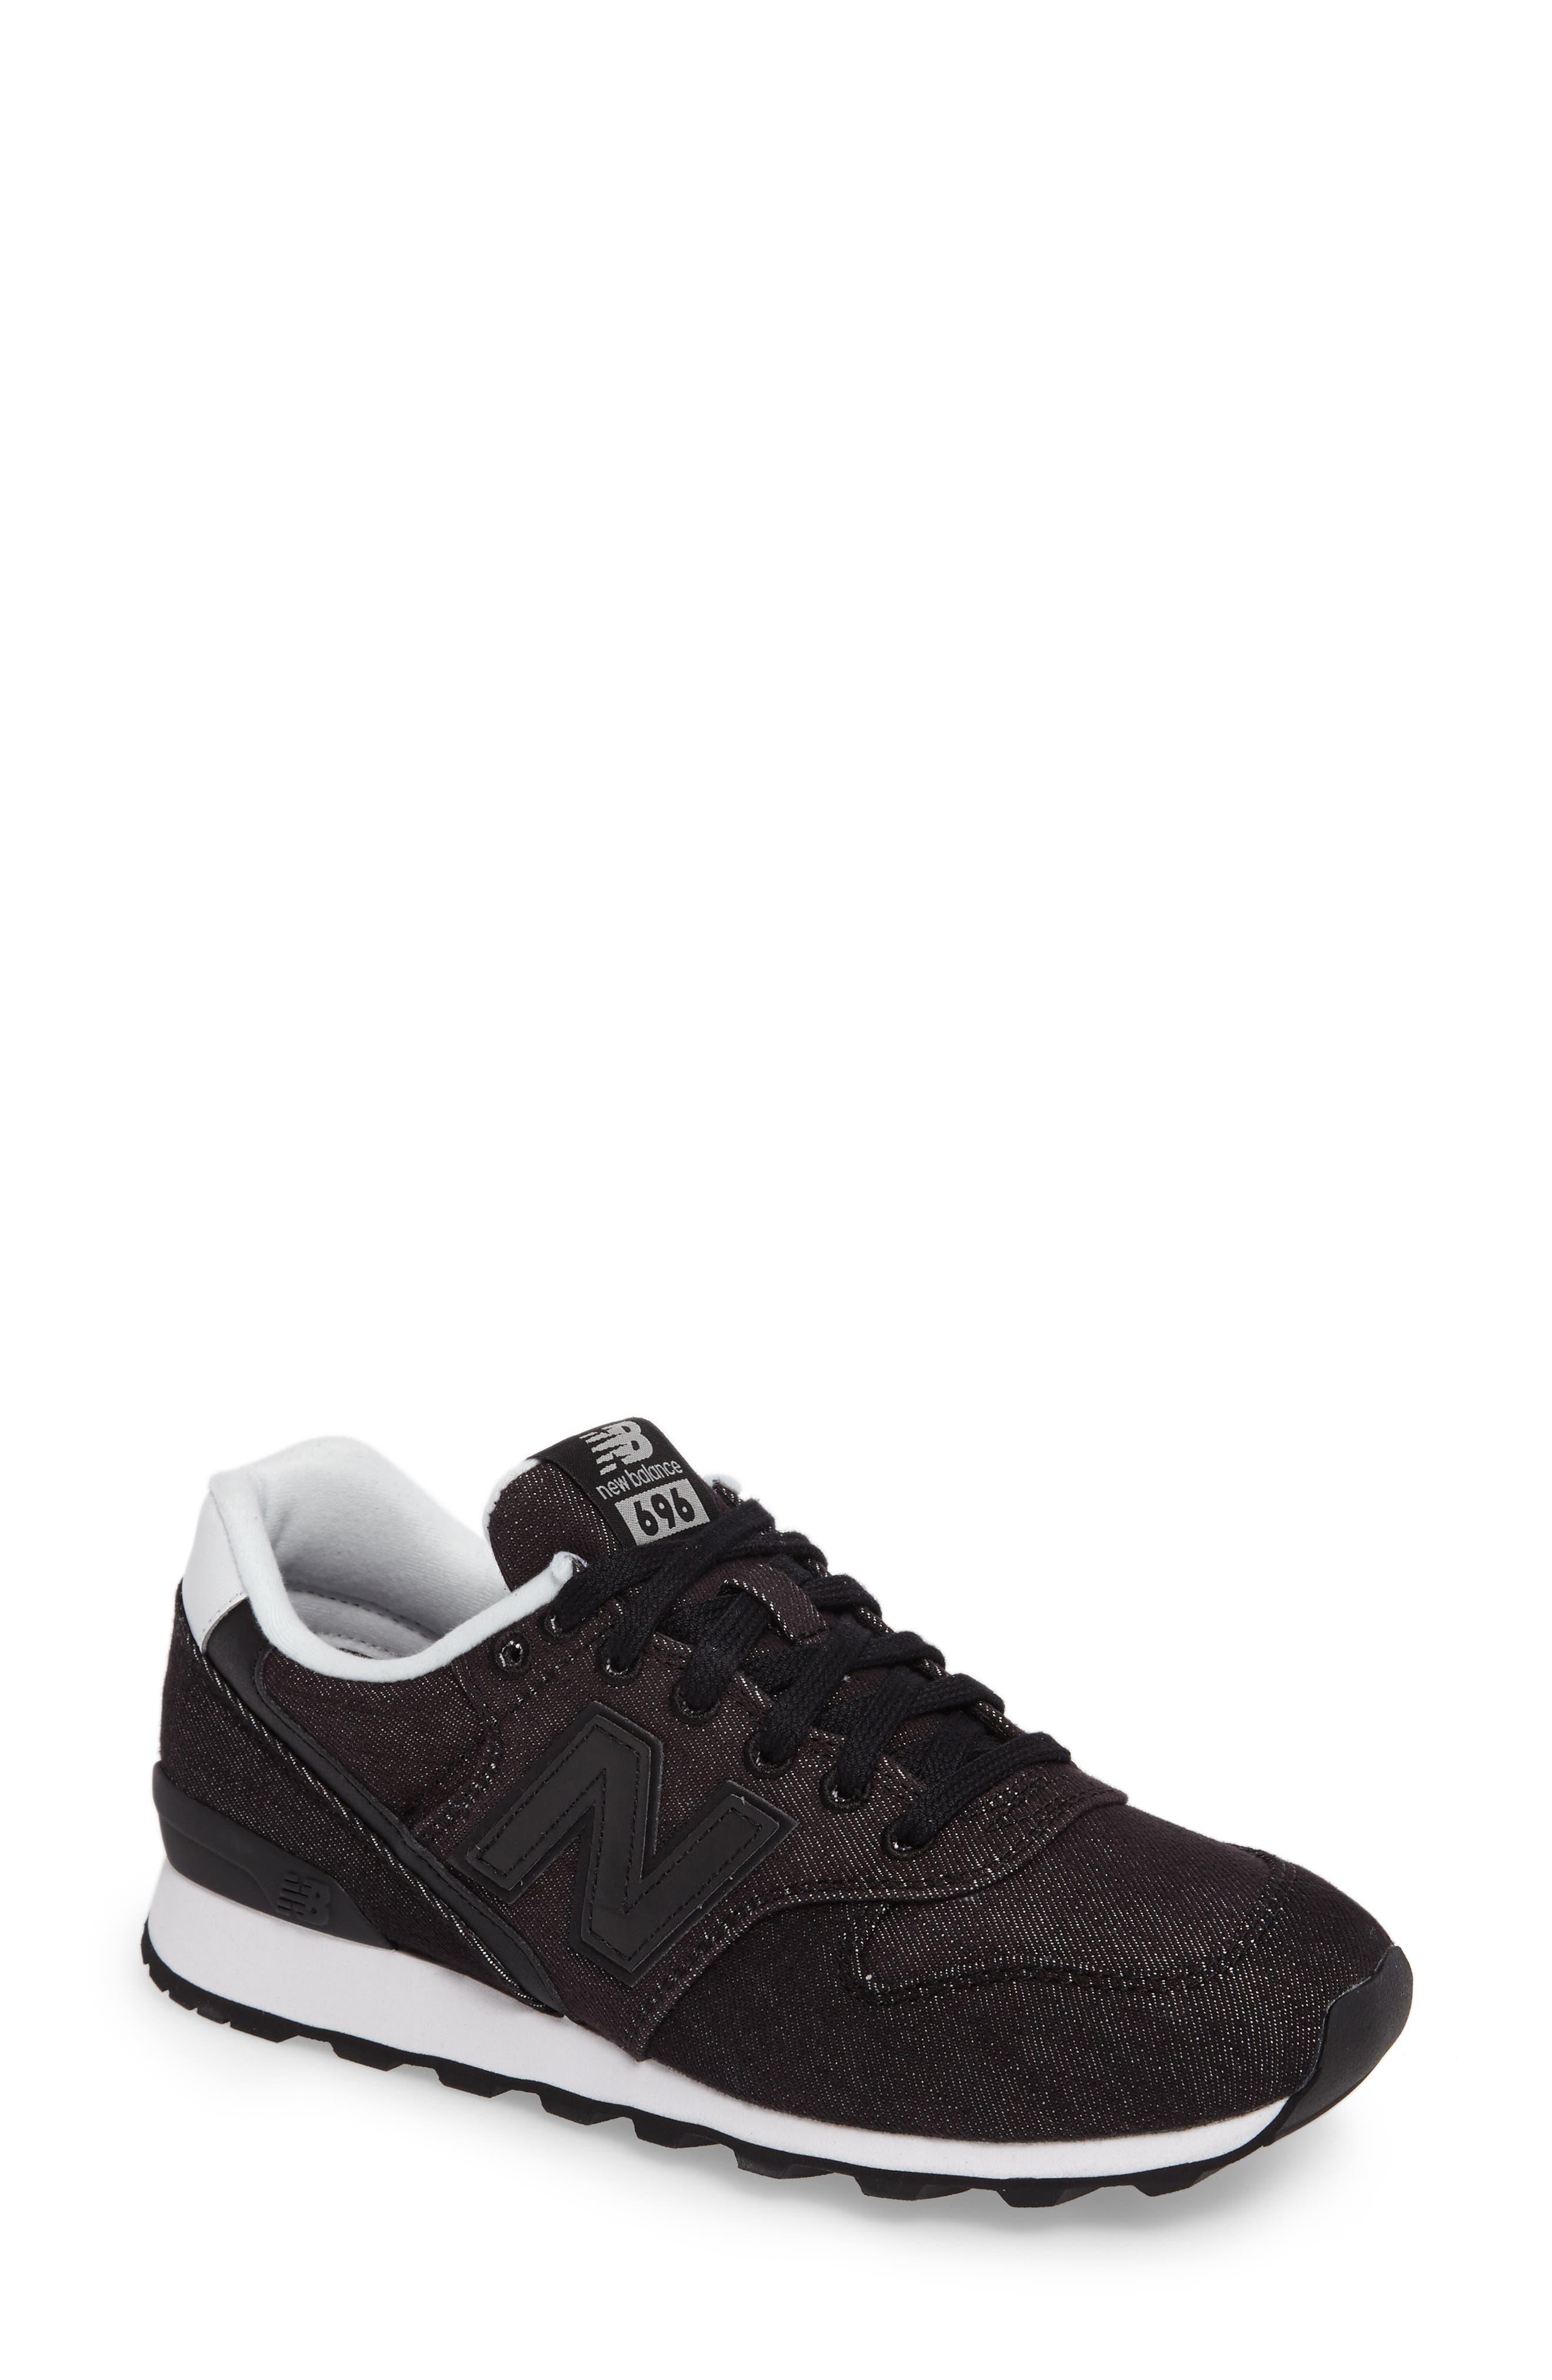 696 Sneaker,                             Main thumbnail 1, color,                             001